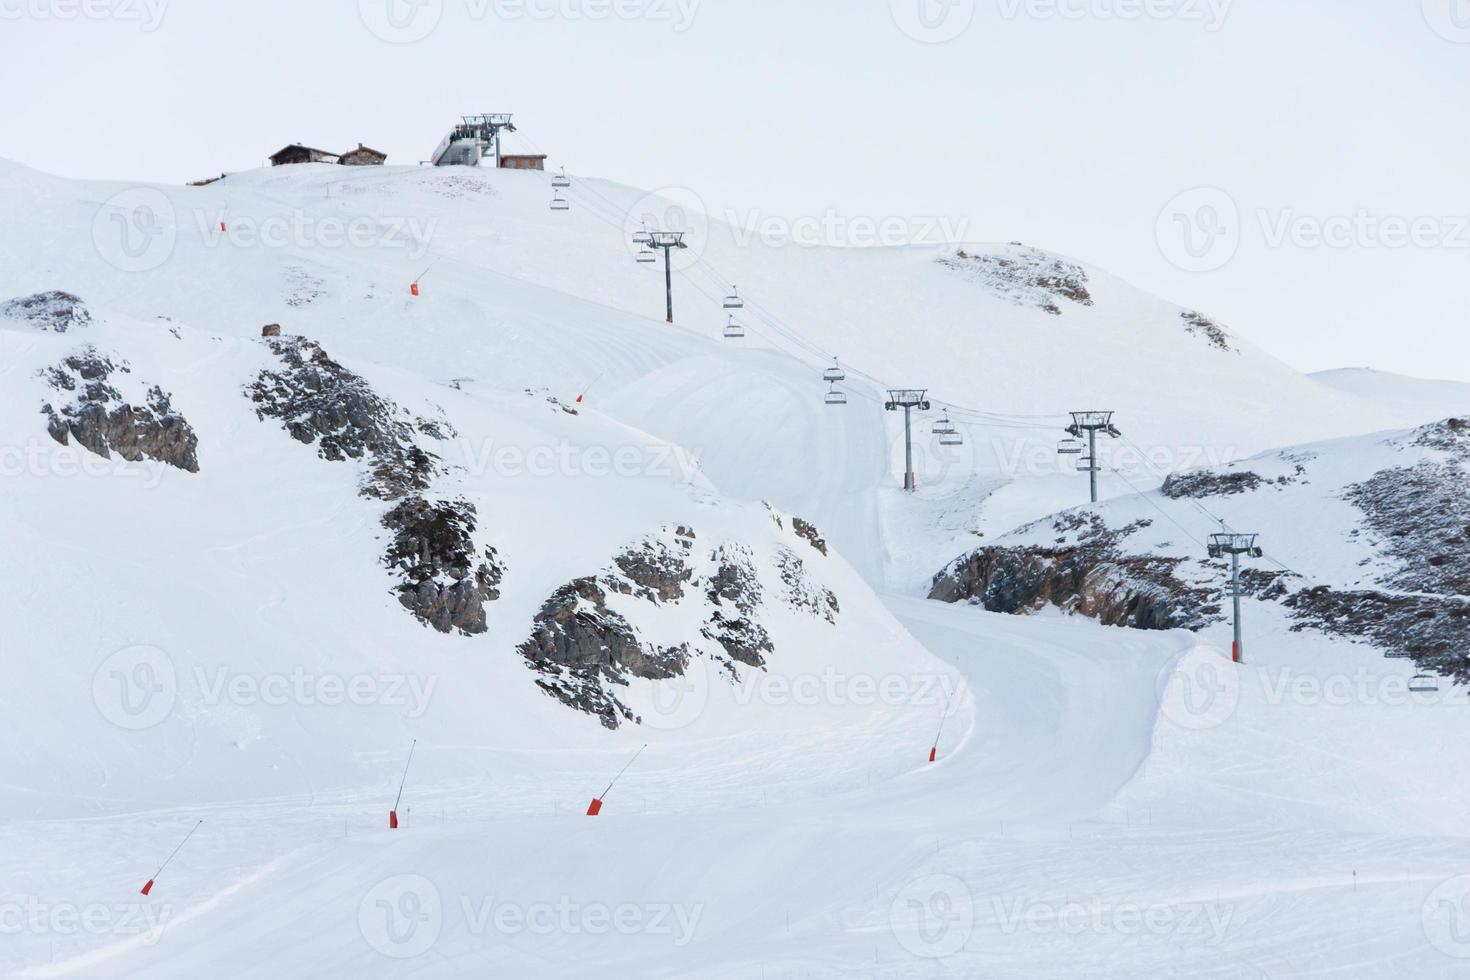 pista de esqui nos Alpes franceses foto